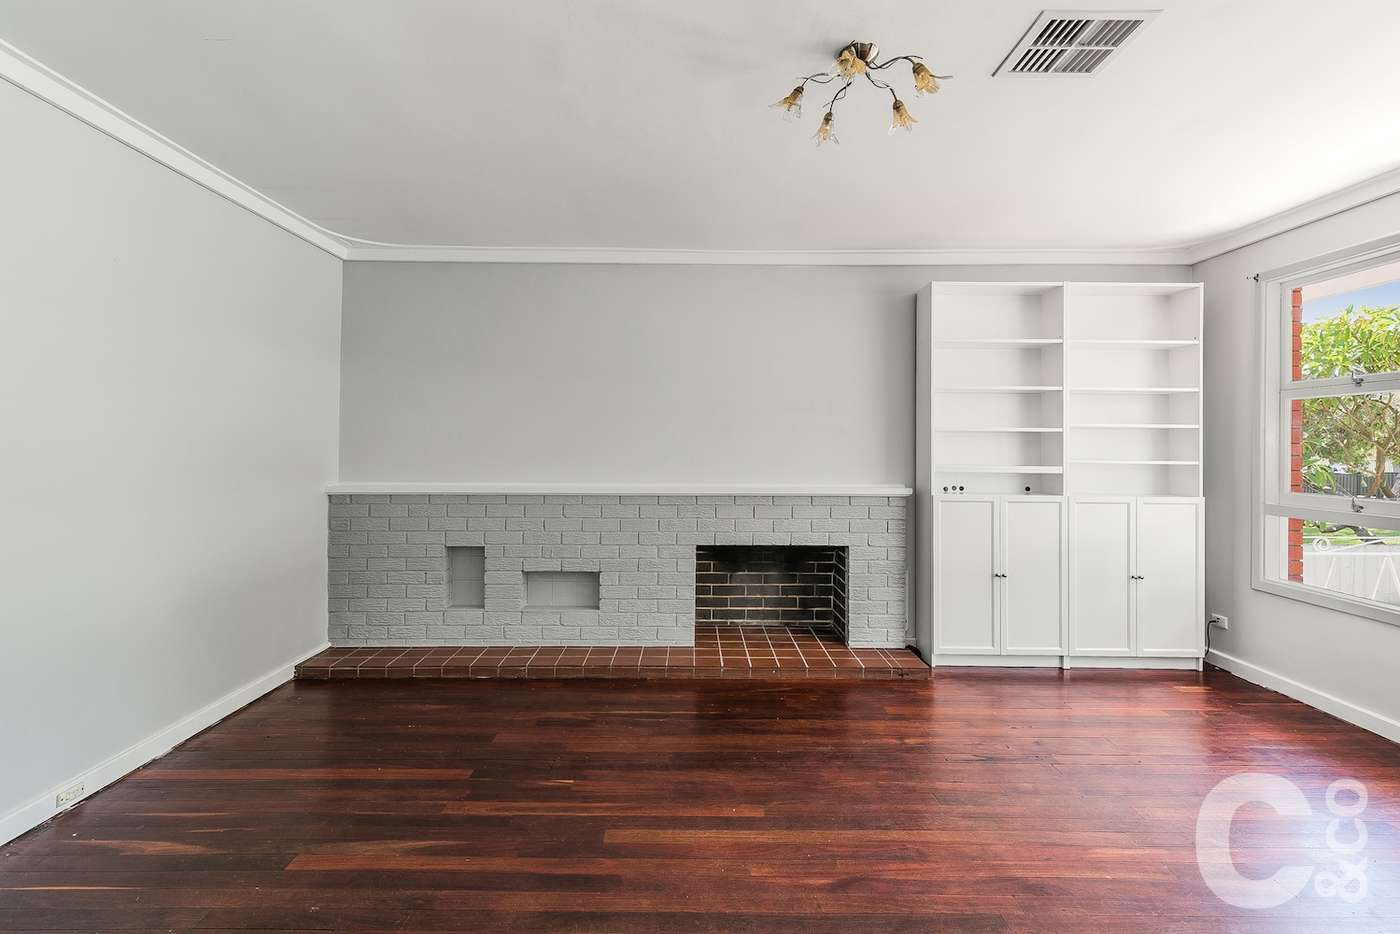 Sixth view of Homely house listing, 60 Christmas Avenue, Orelia WA 6167